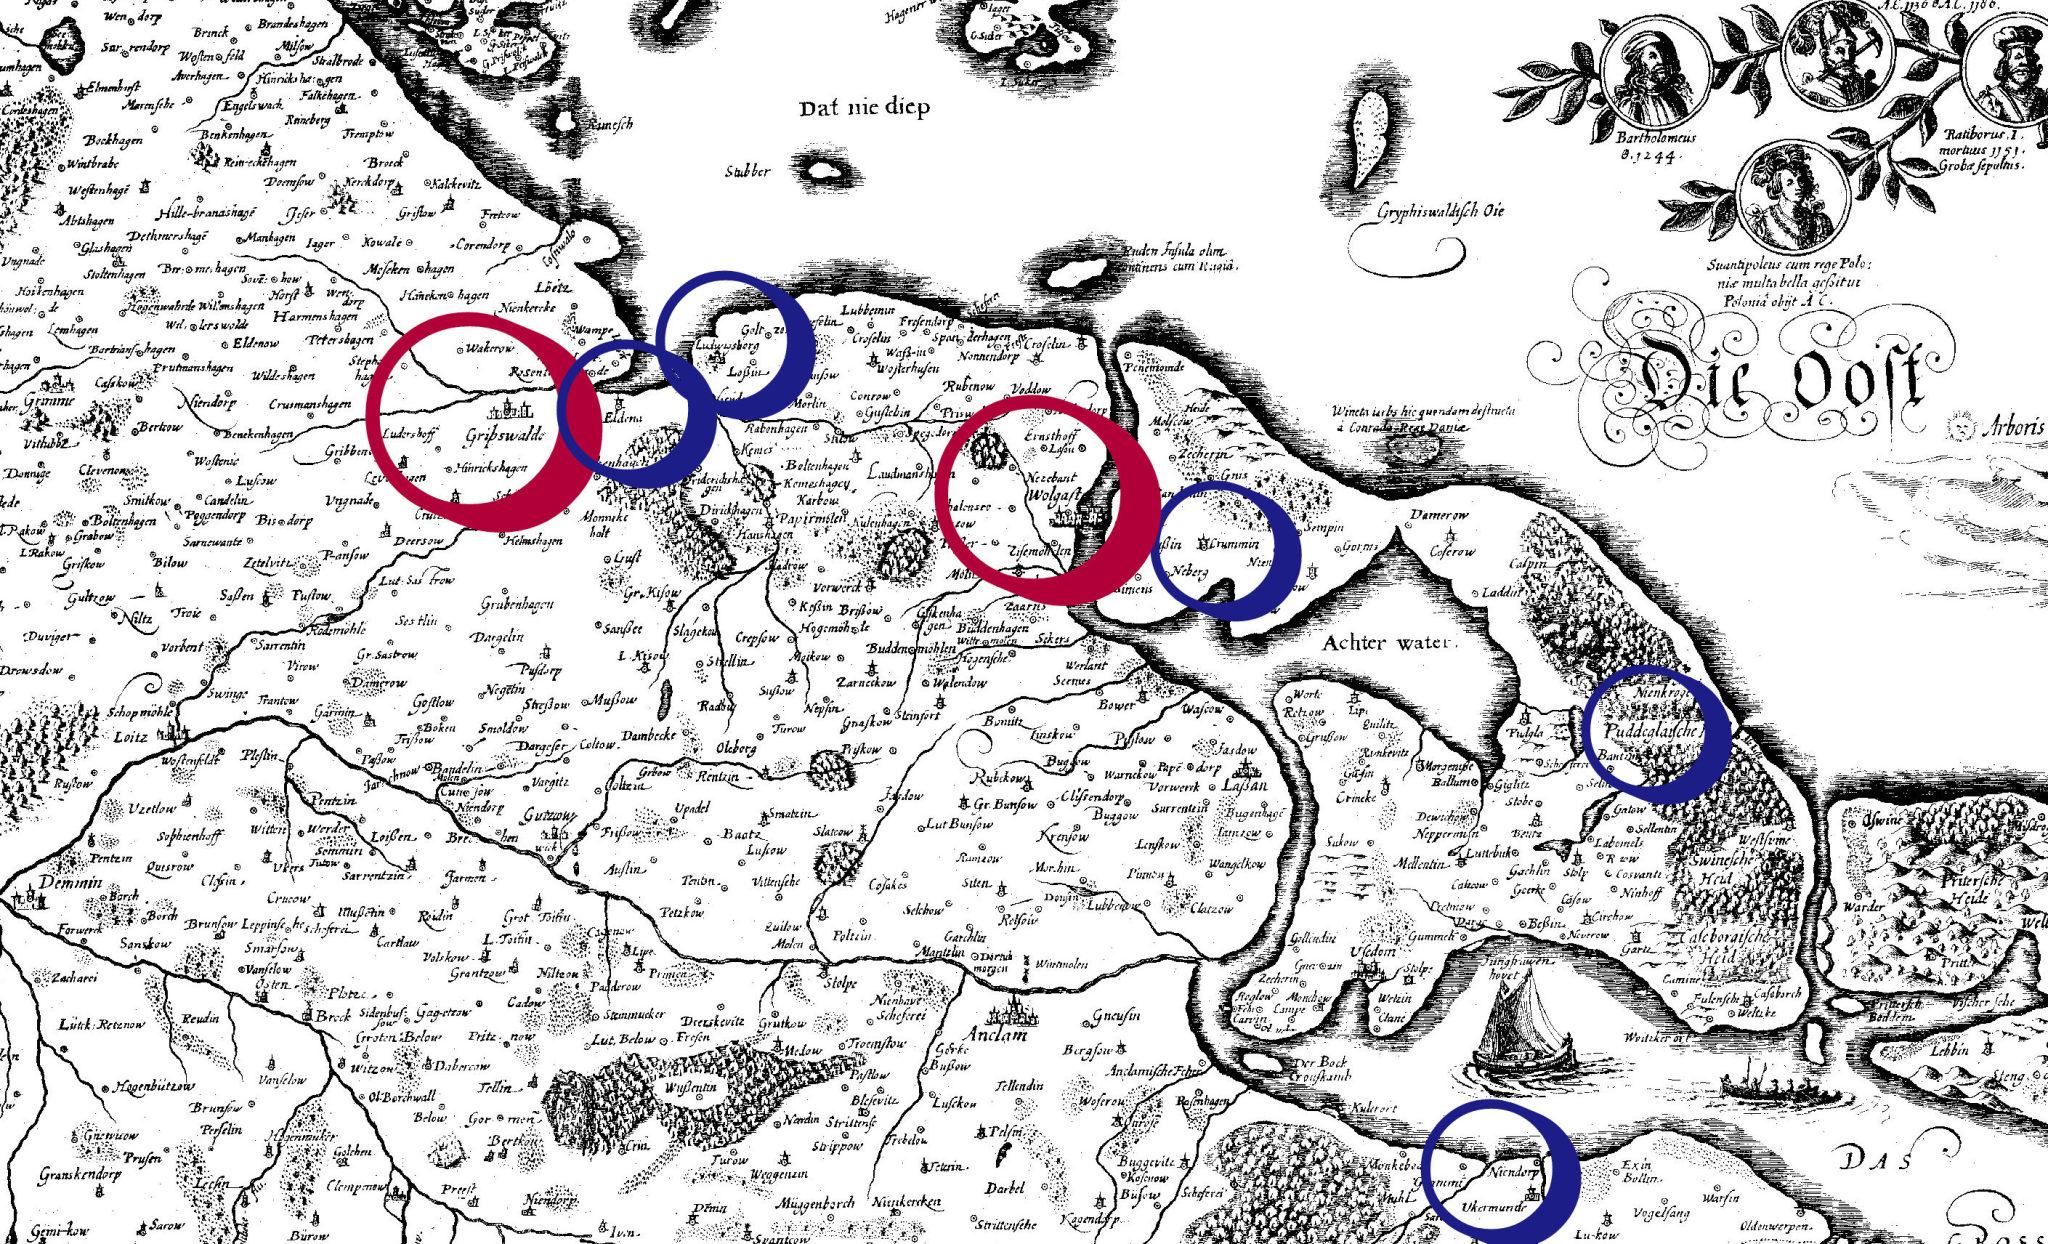 Lubinus.mapka.e.pokidanska.gryfici